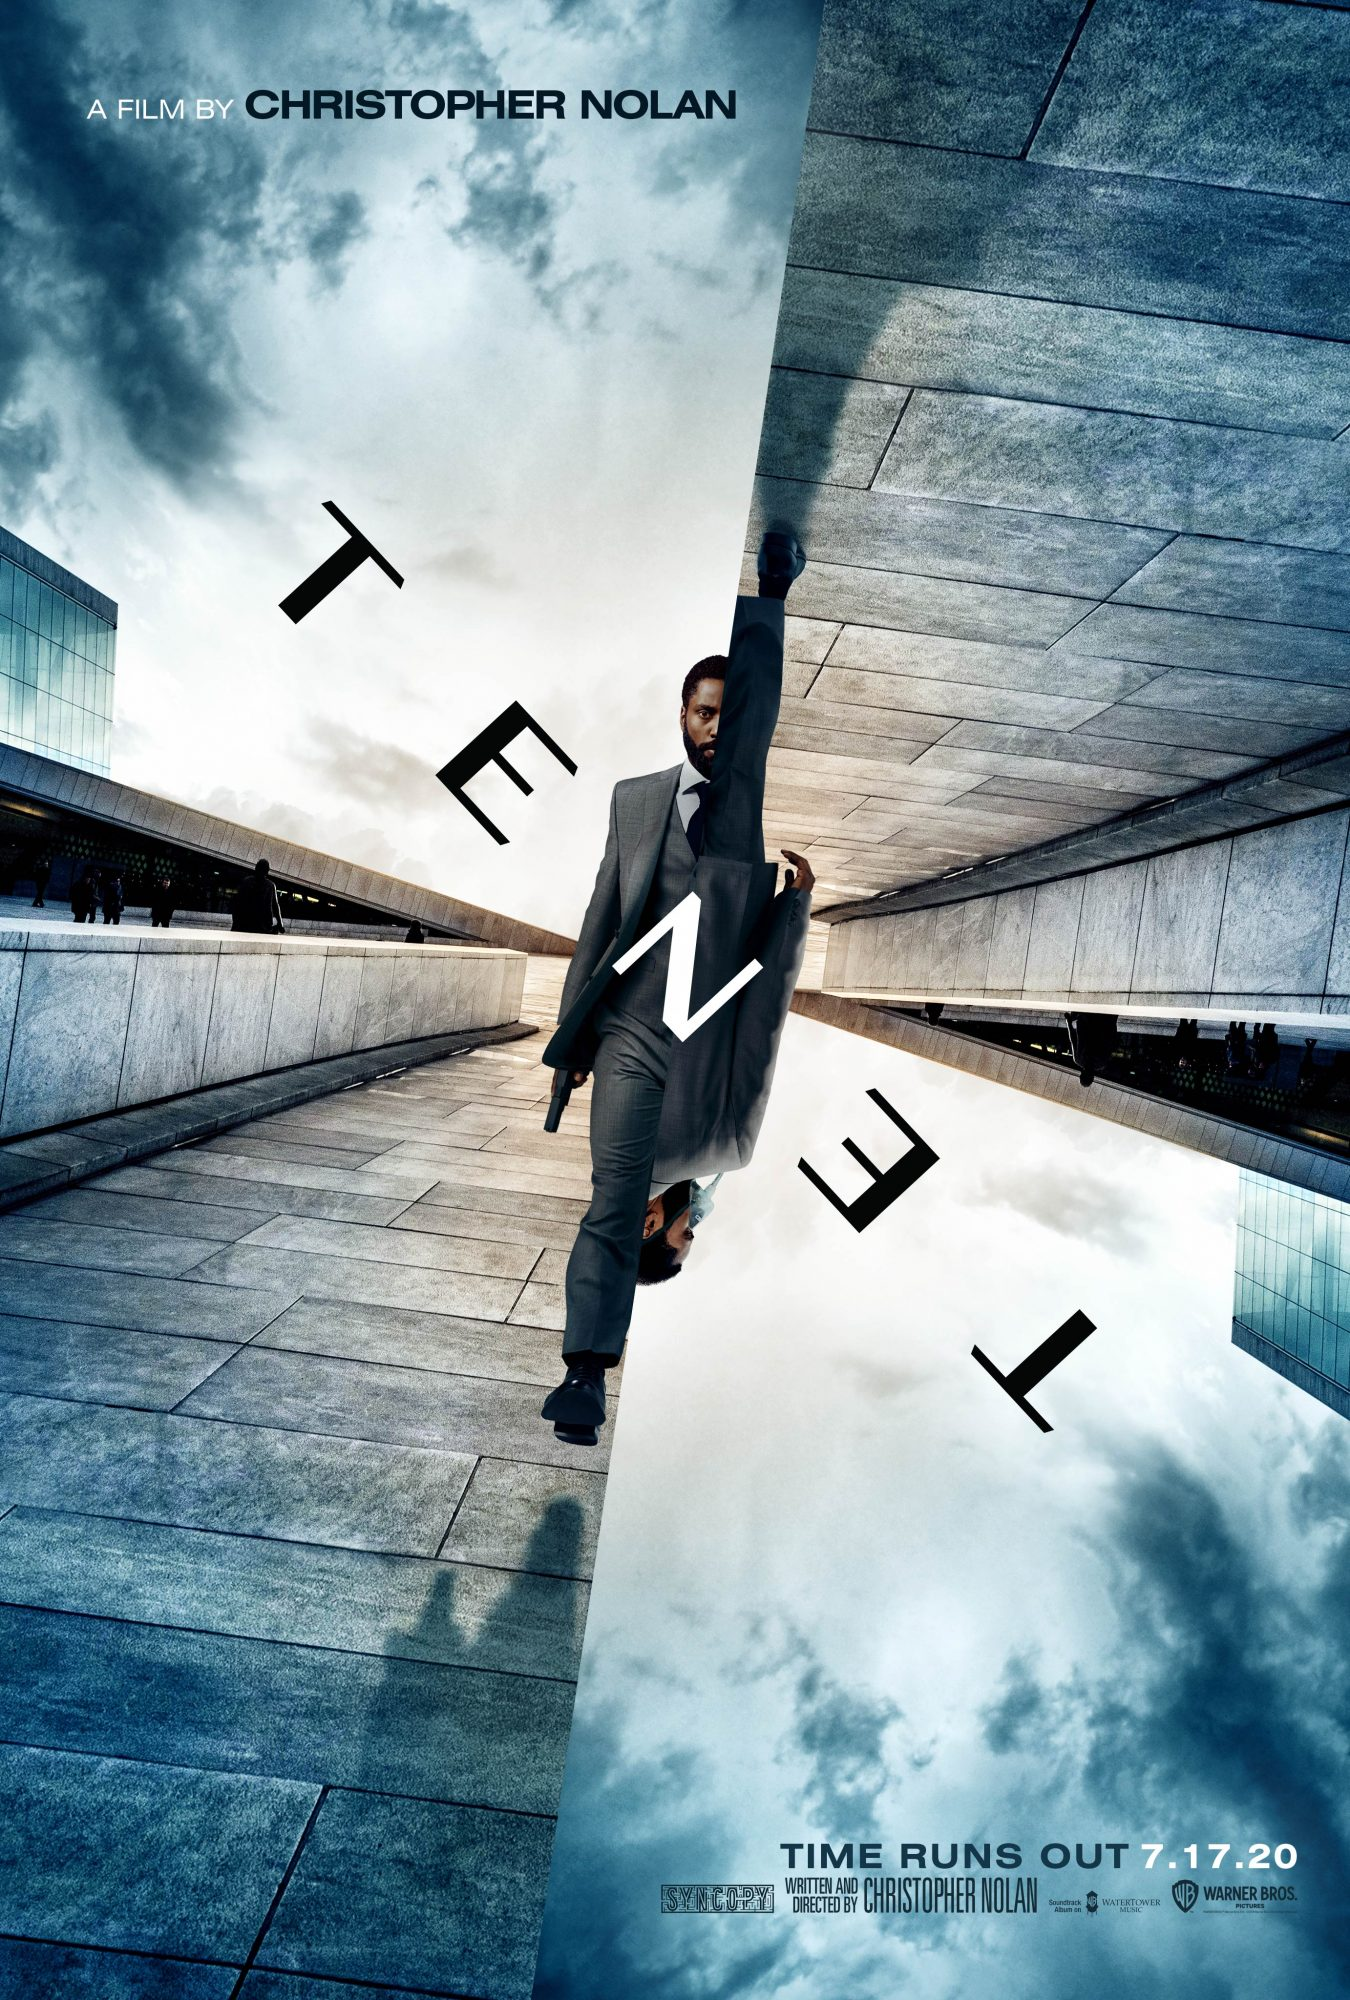 2020 Most Anticipated Sci-Fi Movies - Tenet-poster-with-John-David-Washington